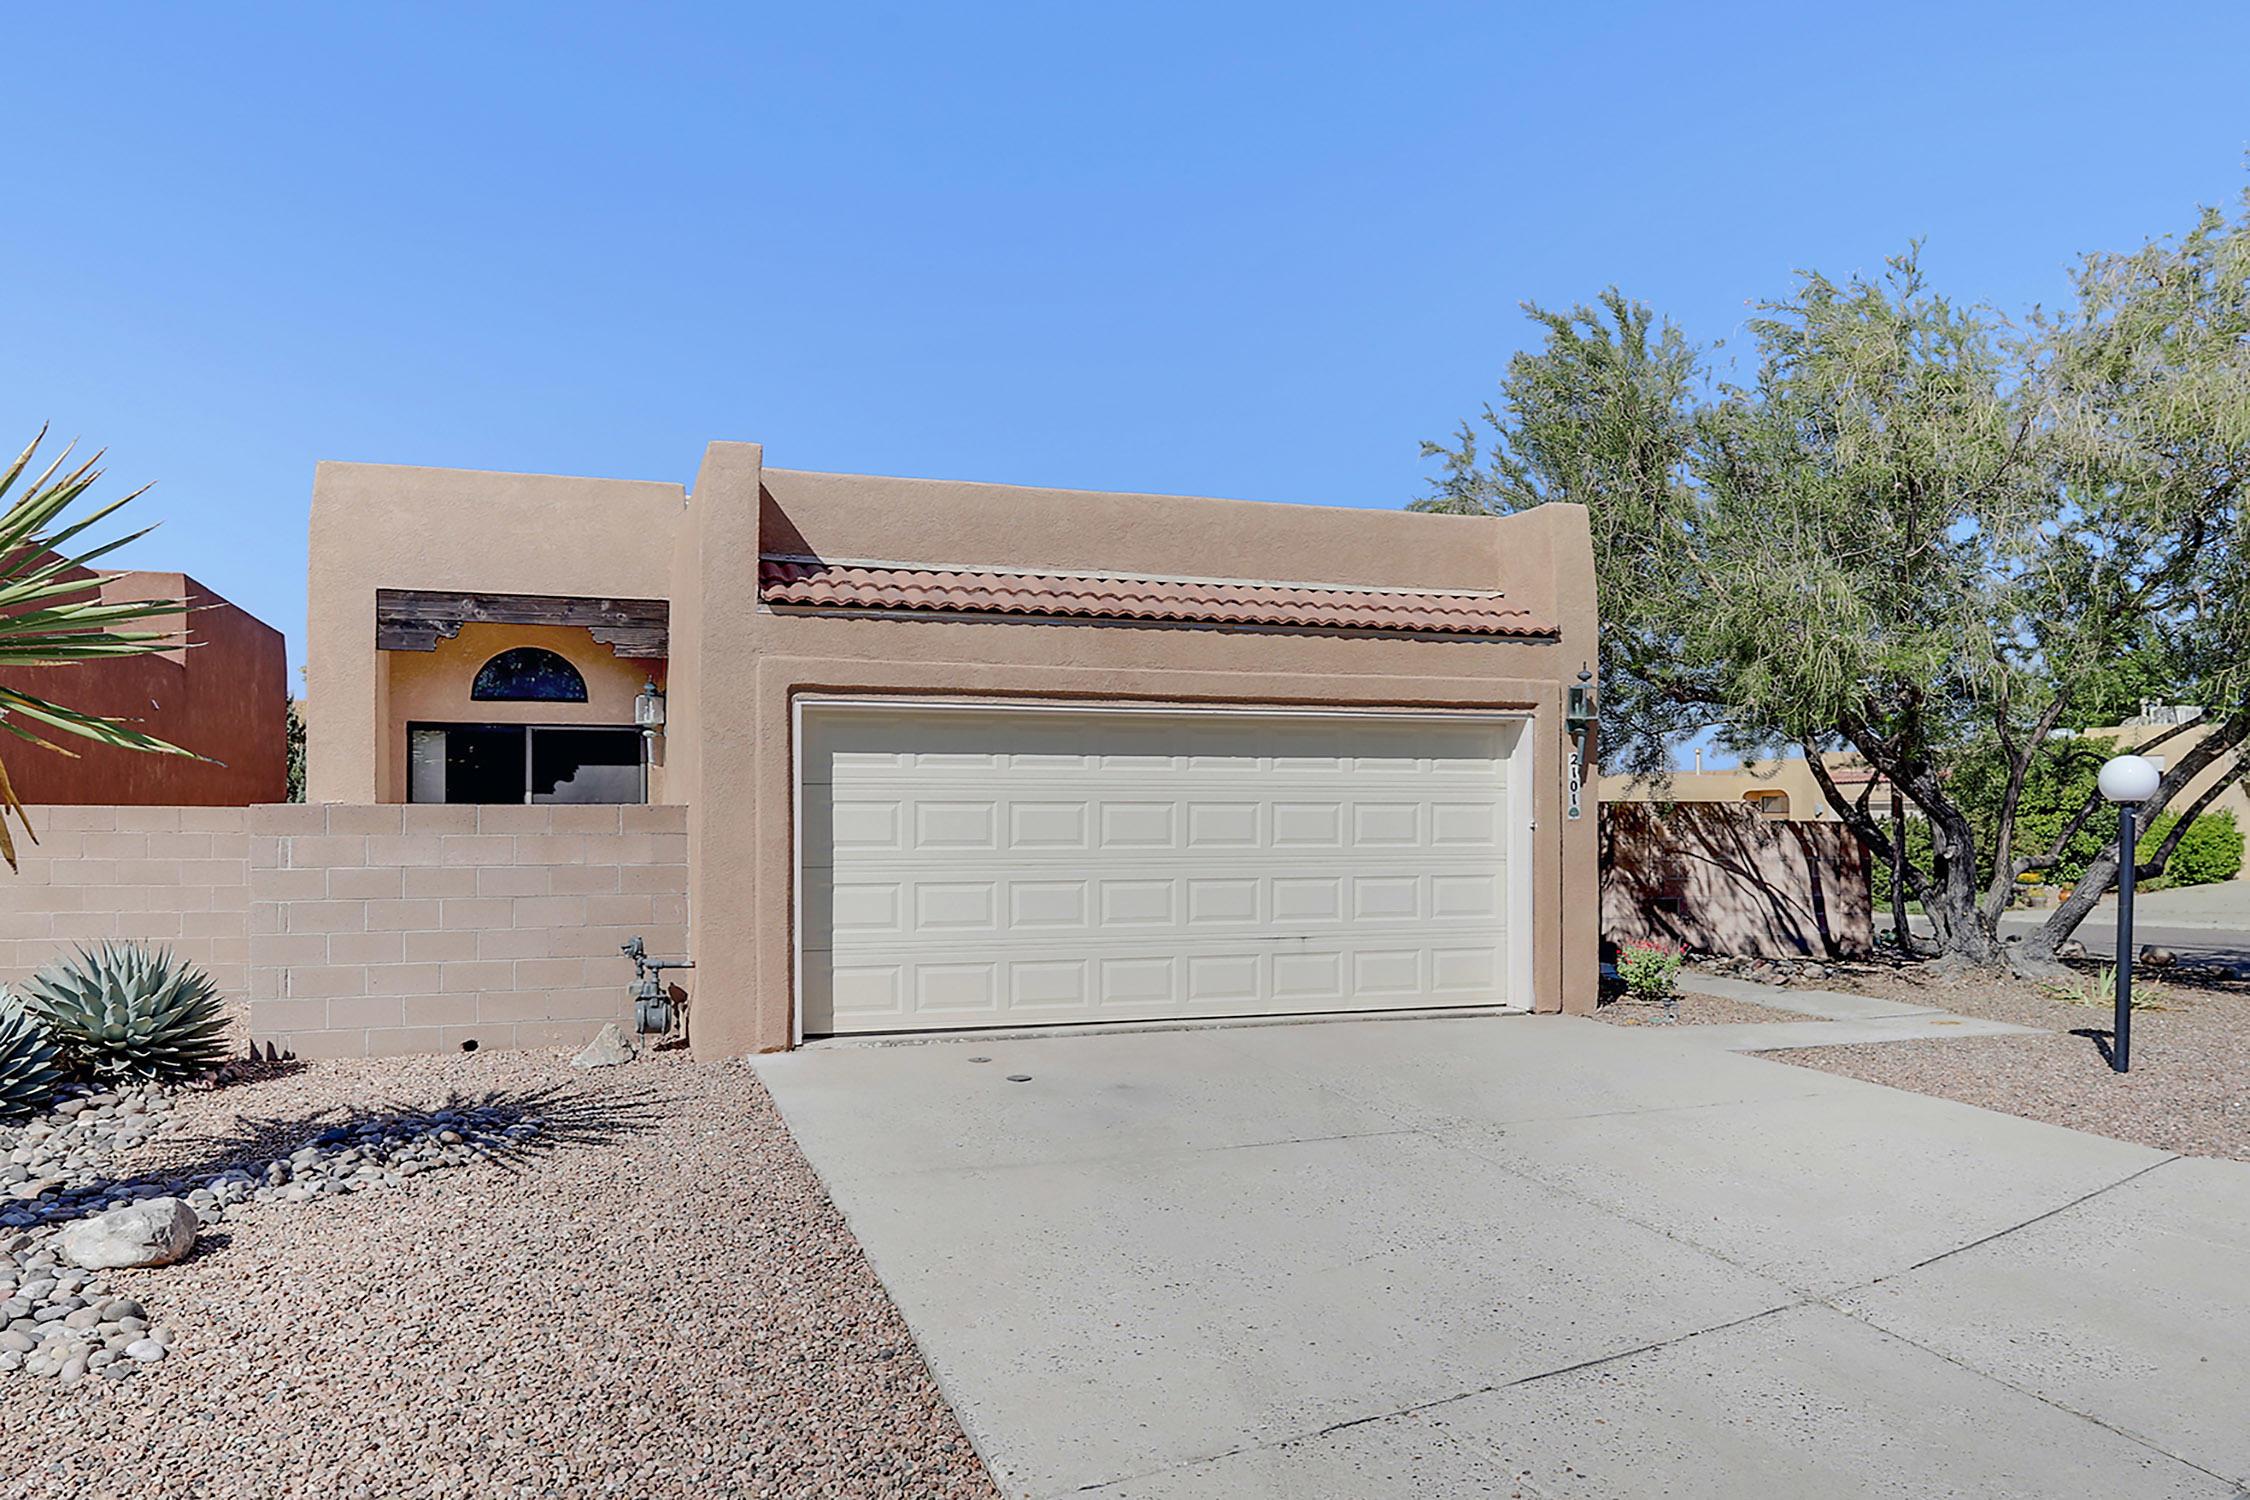 2101 NAVAJO WILLOW Drive, Albuquerque NM 87122